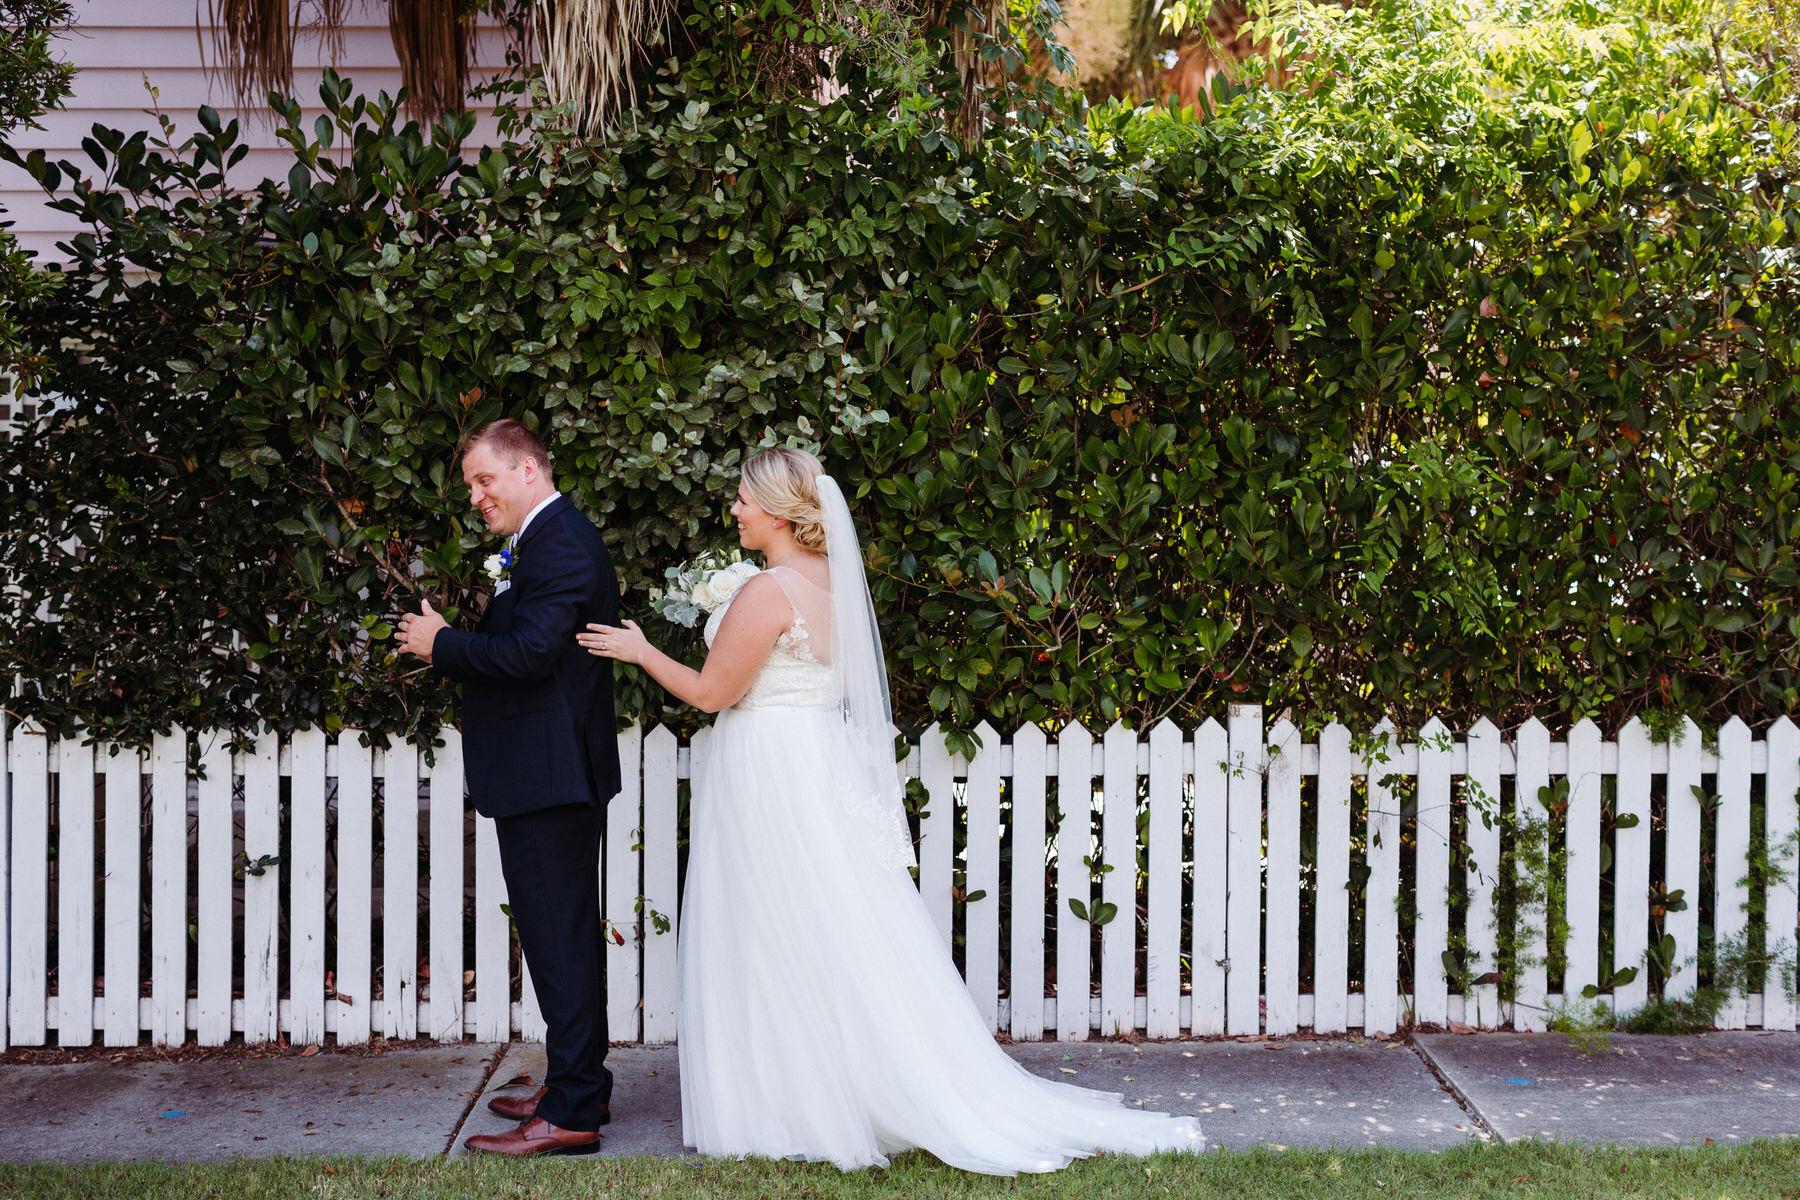 wild-dunes-charleston-isle-of-palms-IOP-wedding-762.JPG